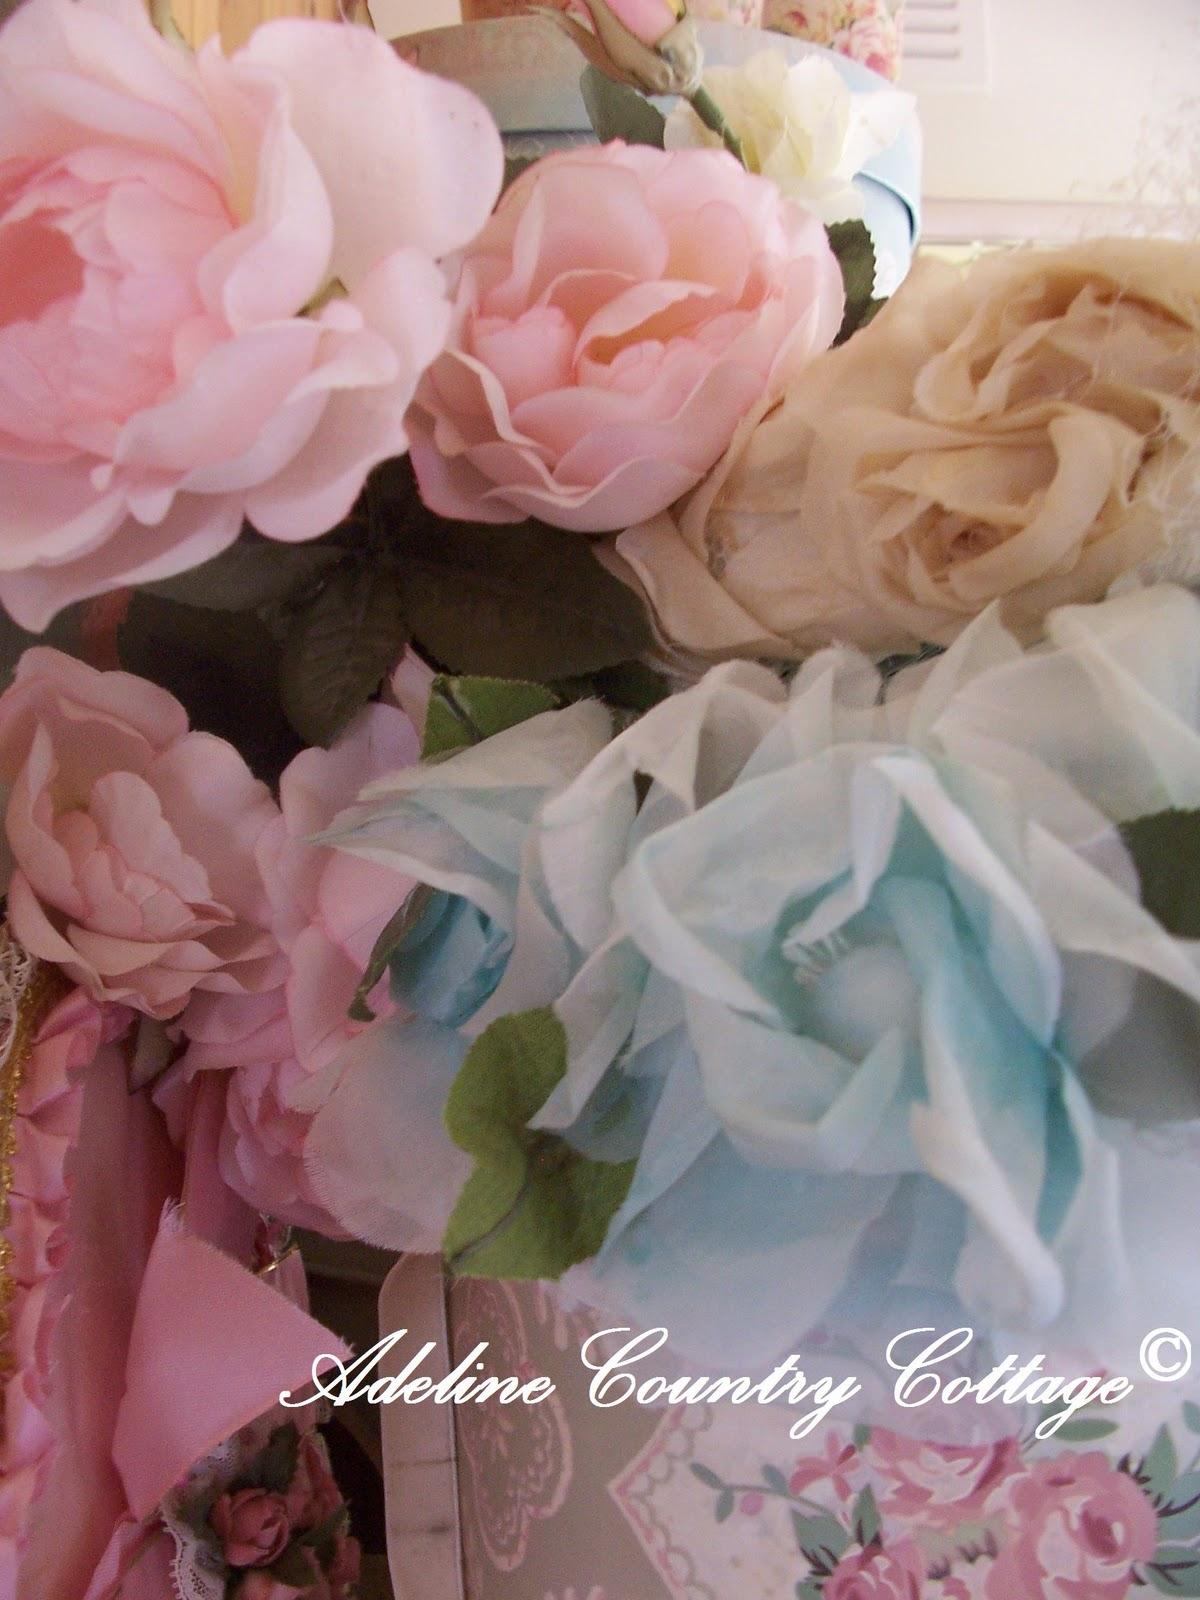 http://2.bp.blogspot.com/_i18Yajy0grc/TH5xBozCtrI/AAAAAAAABC8/1S1IRh_Hpy8/s1600/vintage+flower+millinery+hats+1.jpg